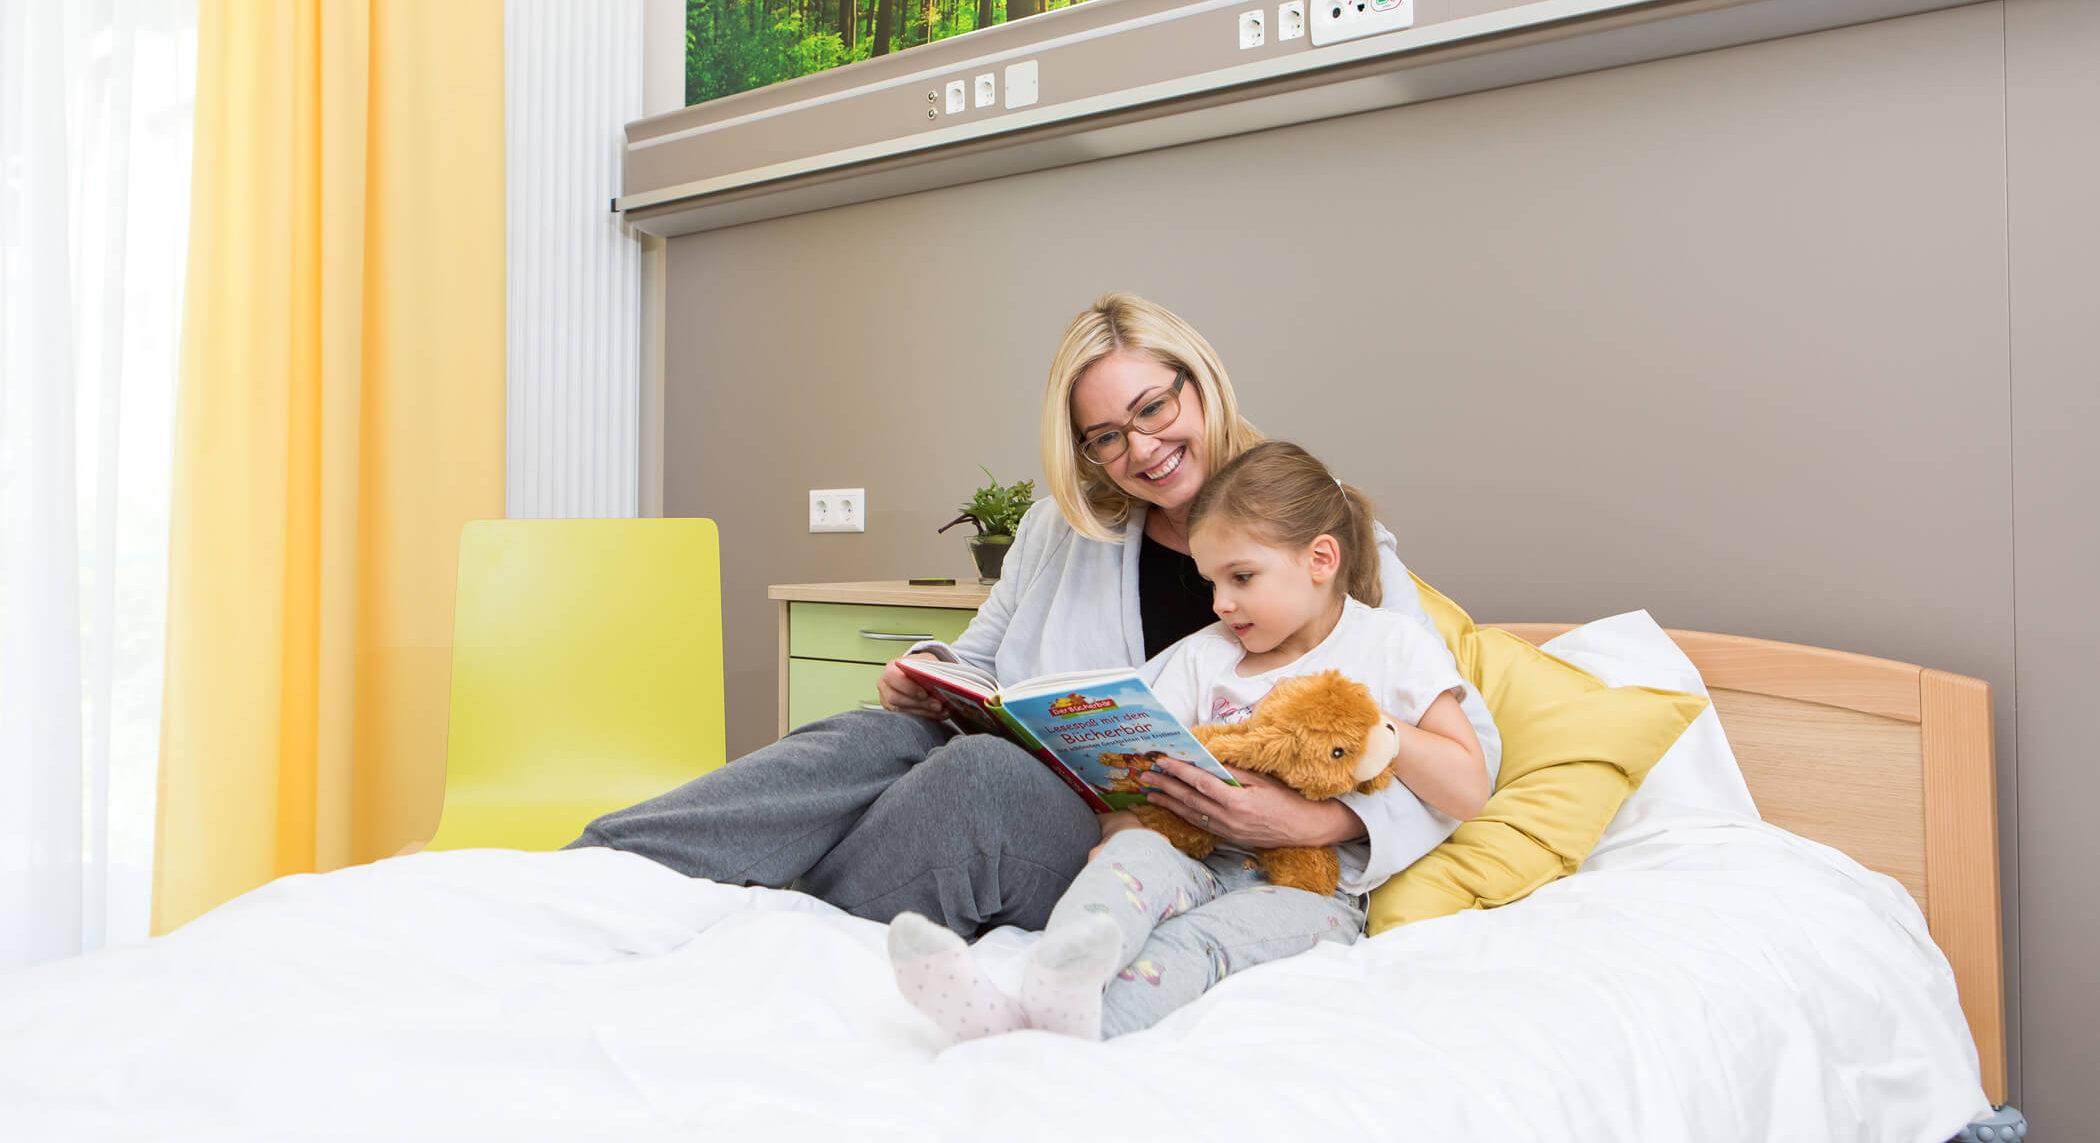 OptimaMed-Wildbad-Kinderreha-Zimmer-Geschichte-vorlesen